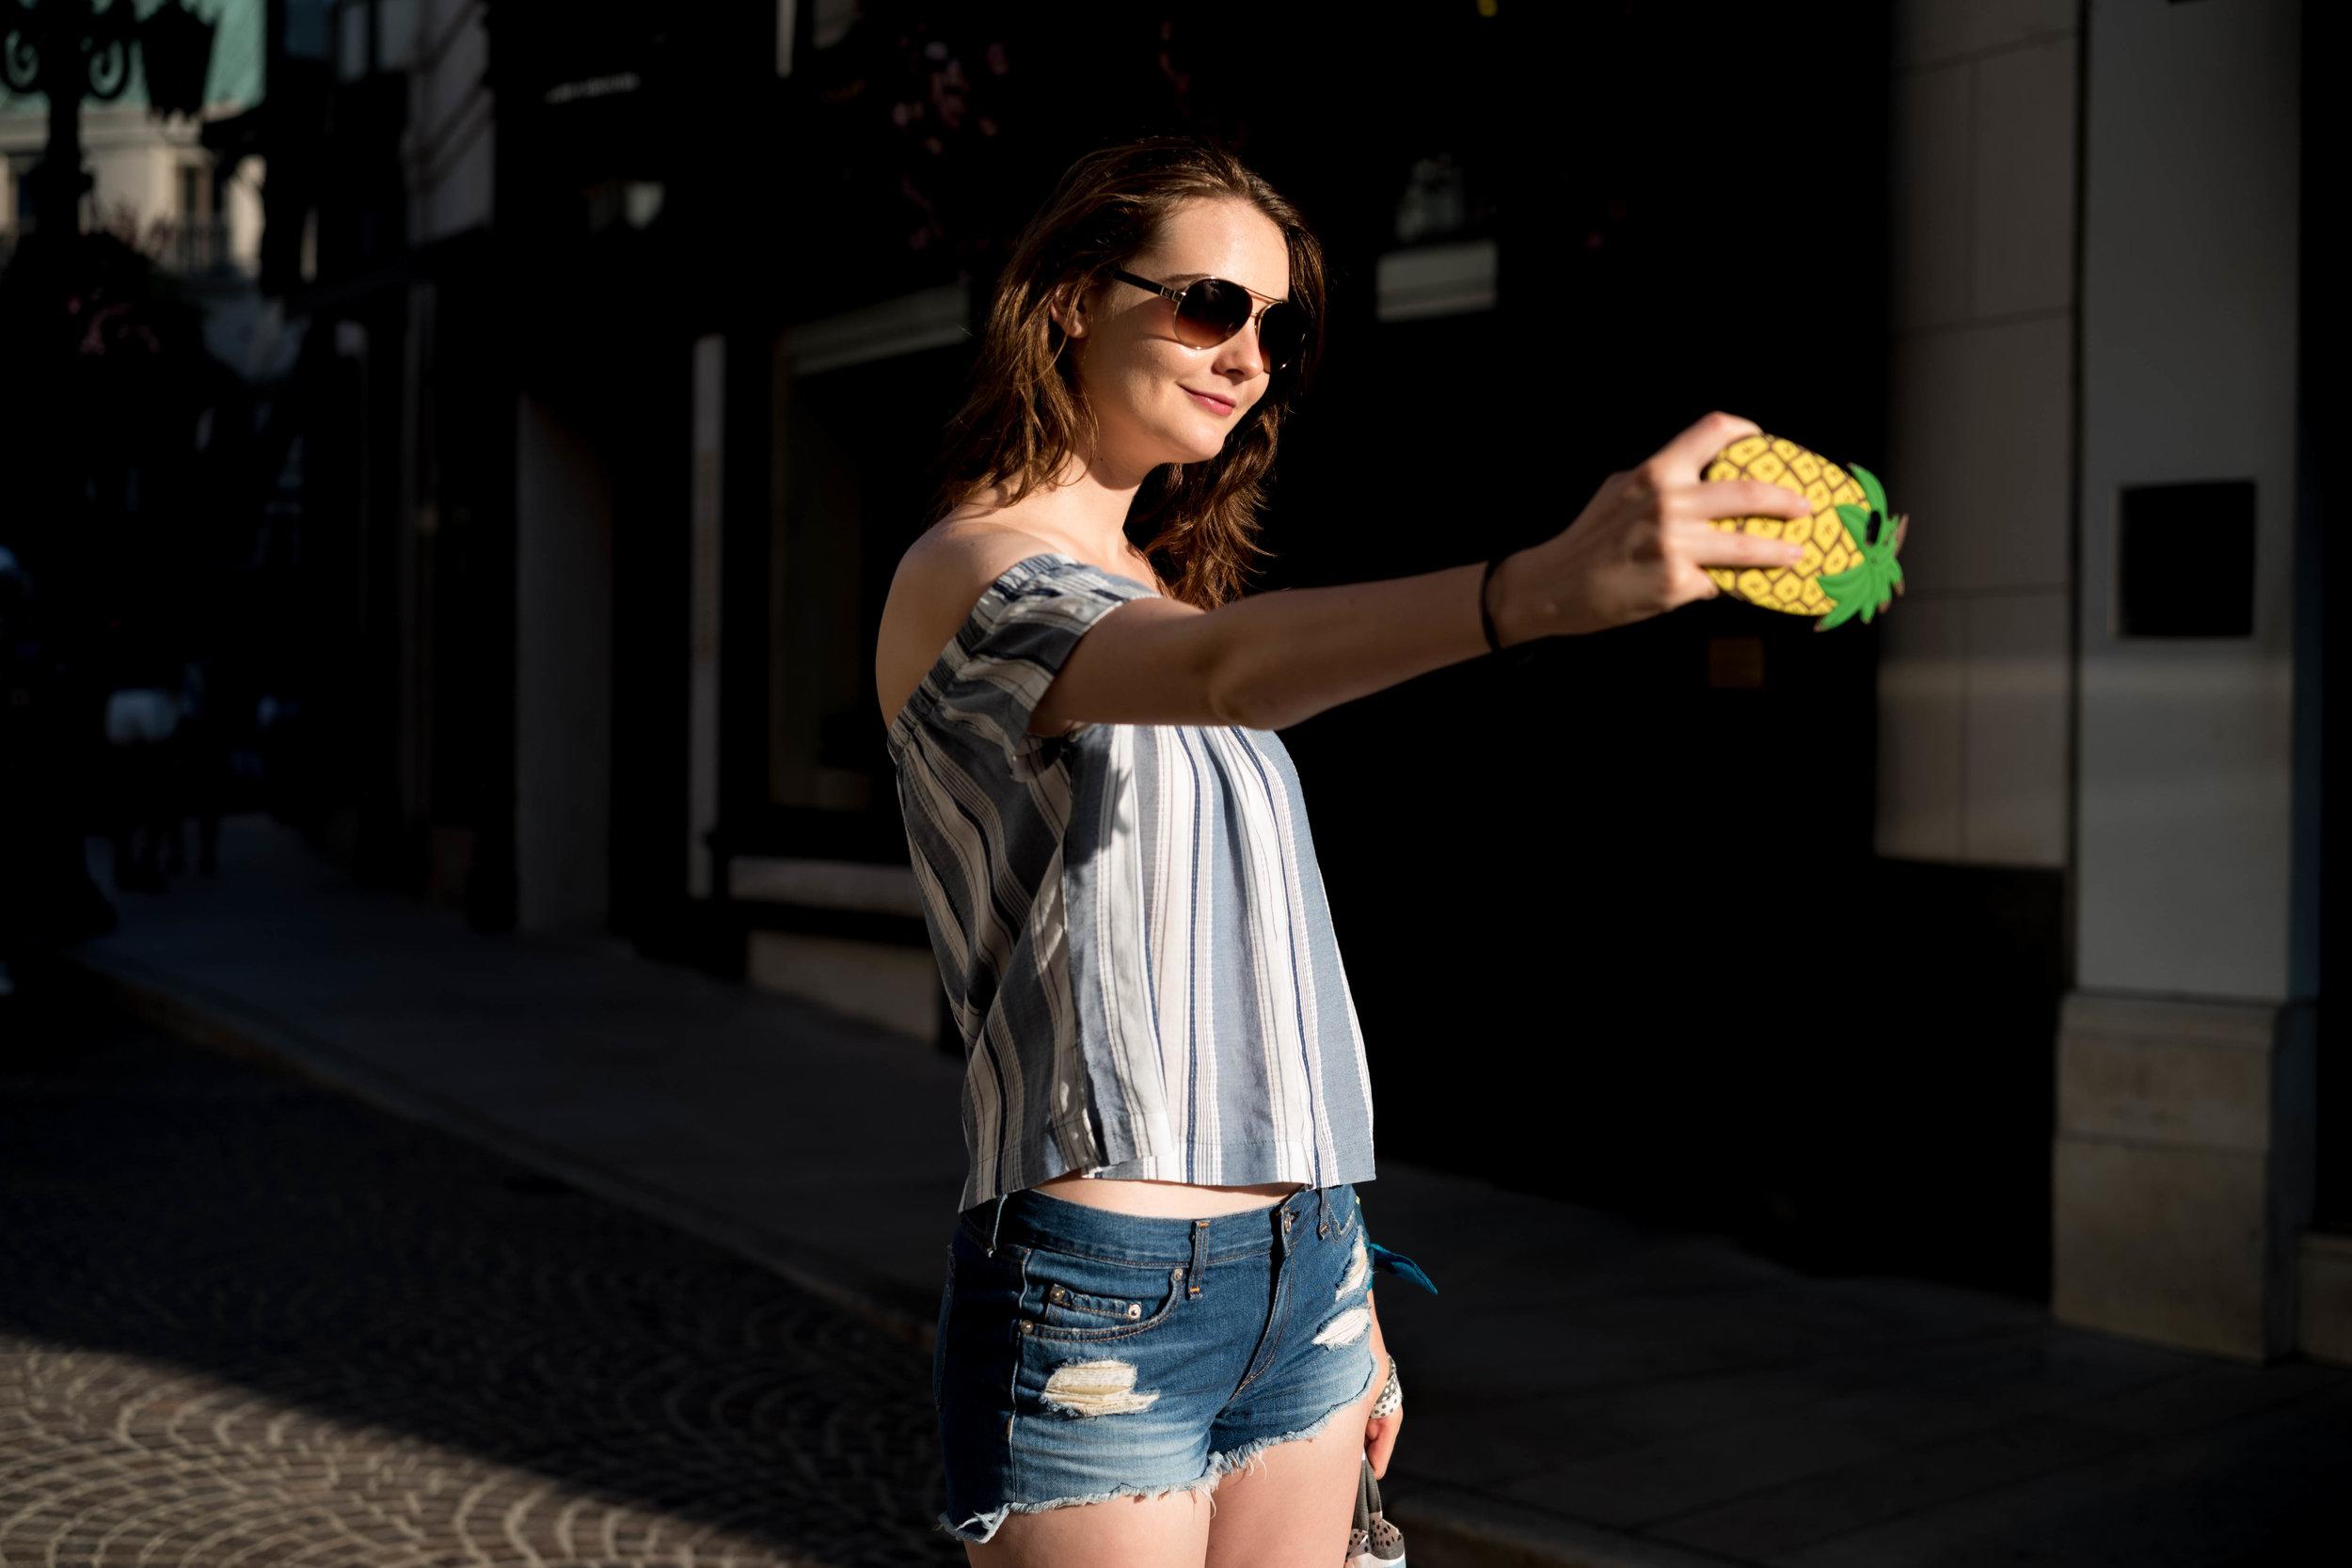 A selfie on Via Rodeo. Leica APO 50mm f/2 Summicron ASPH